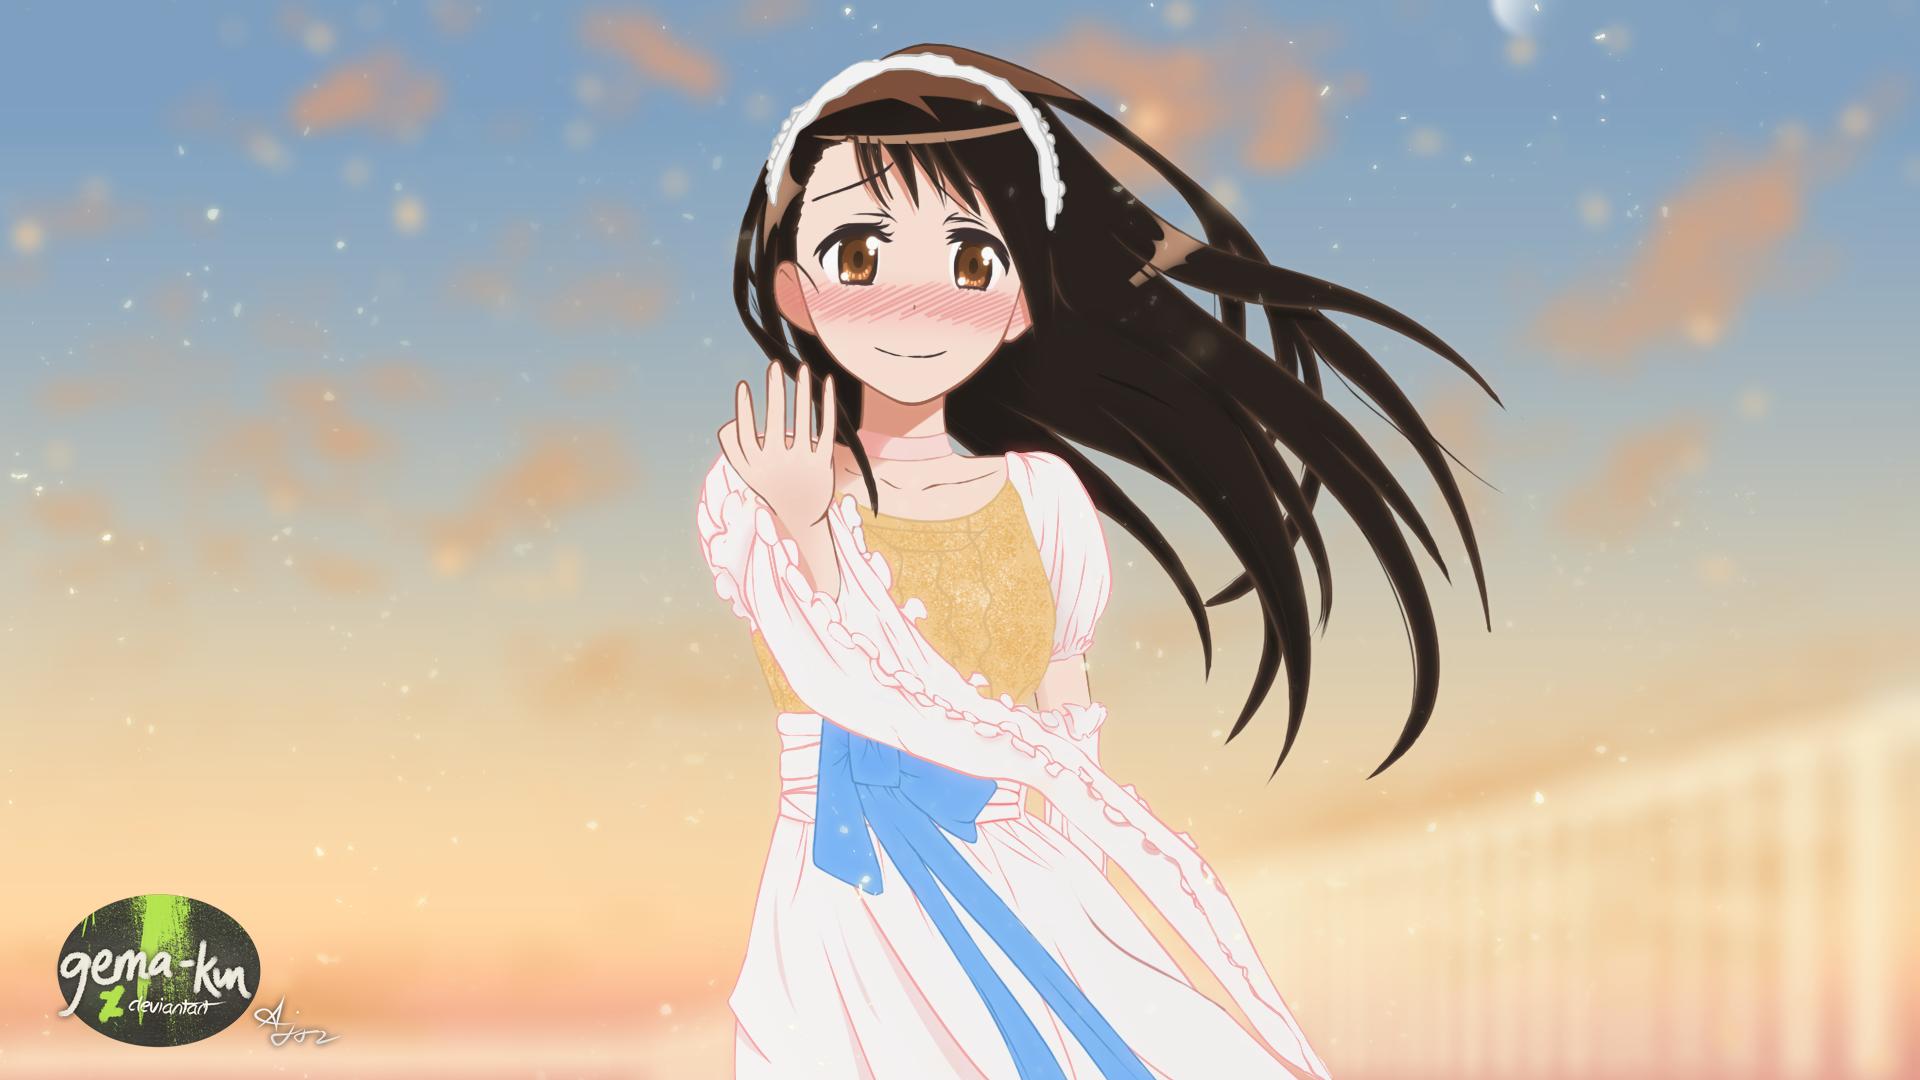 Nisekoi HD Wallpaper Background Image 1920x1080 ID816432 1920x1080